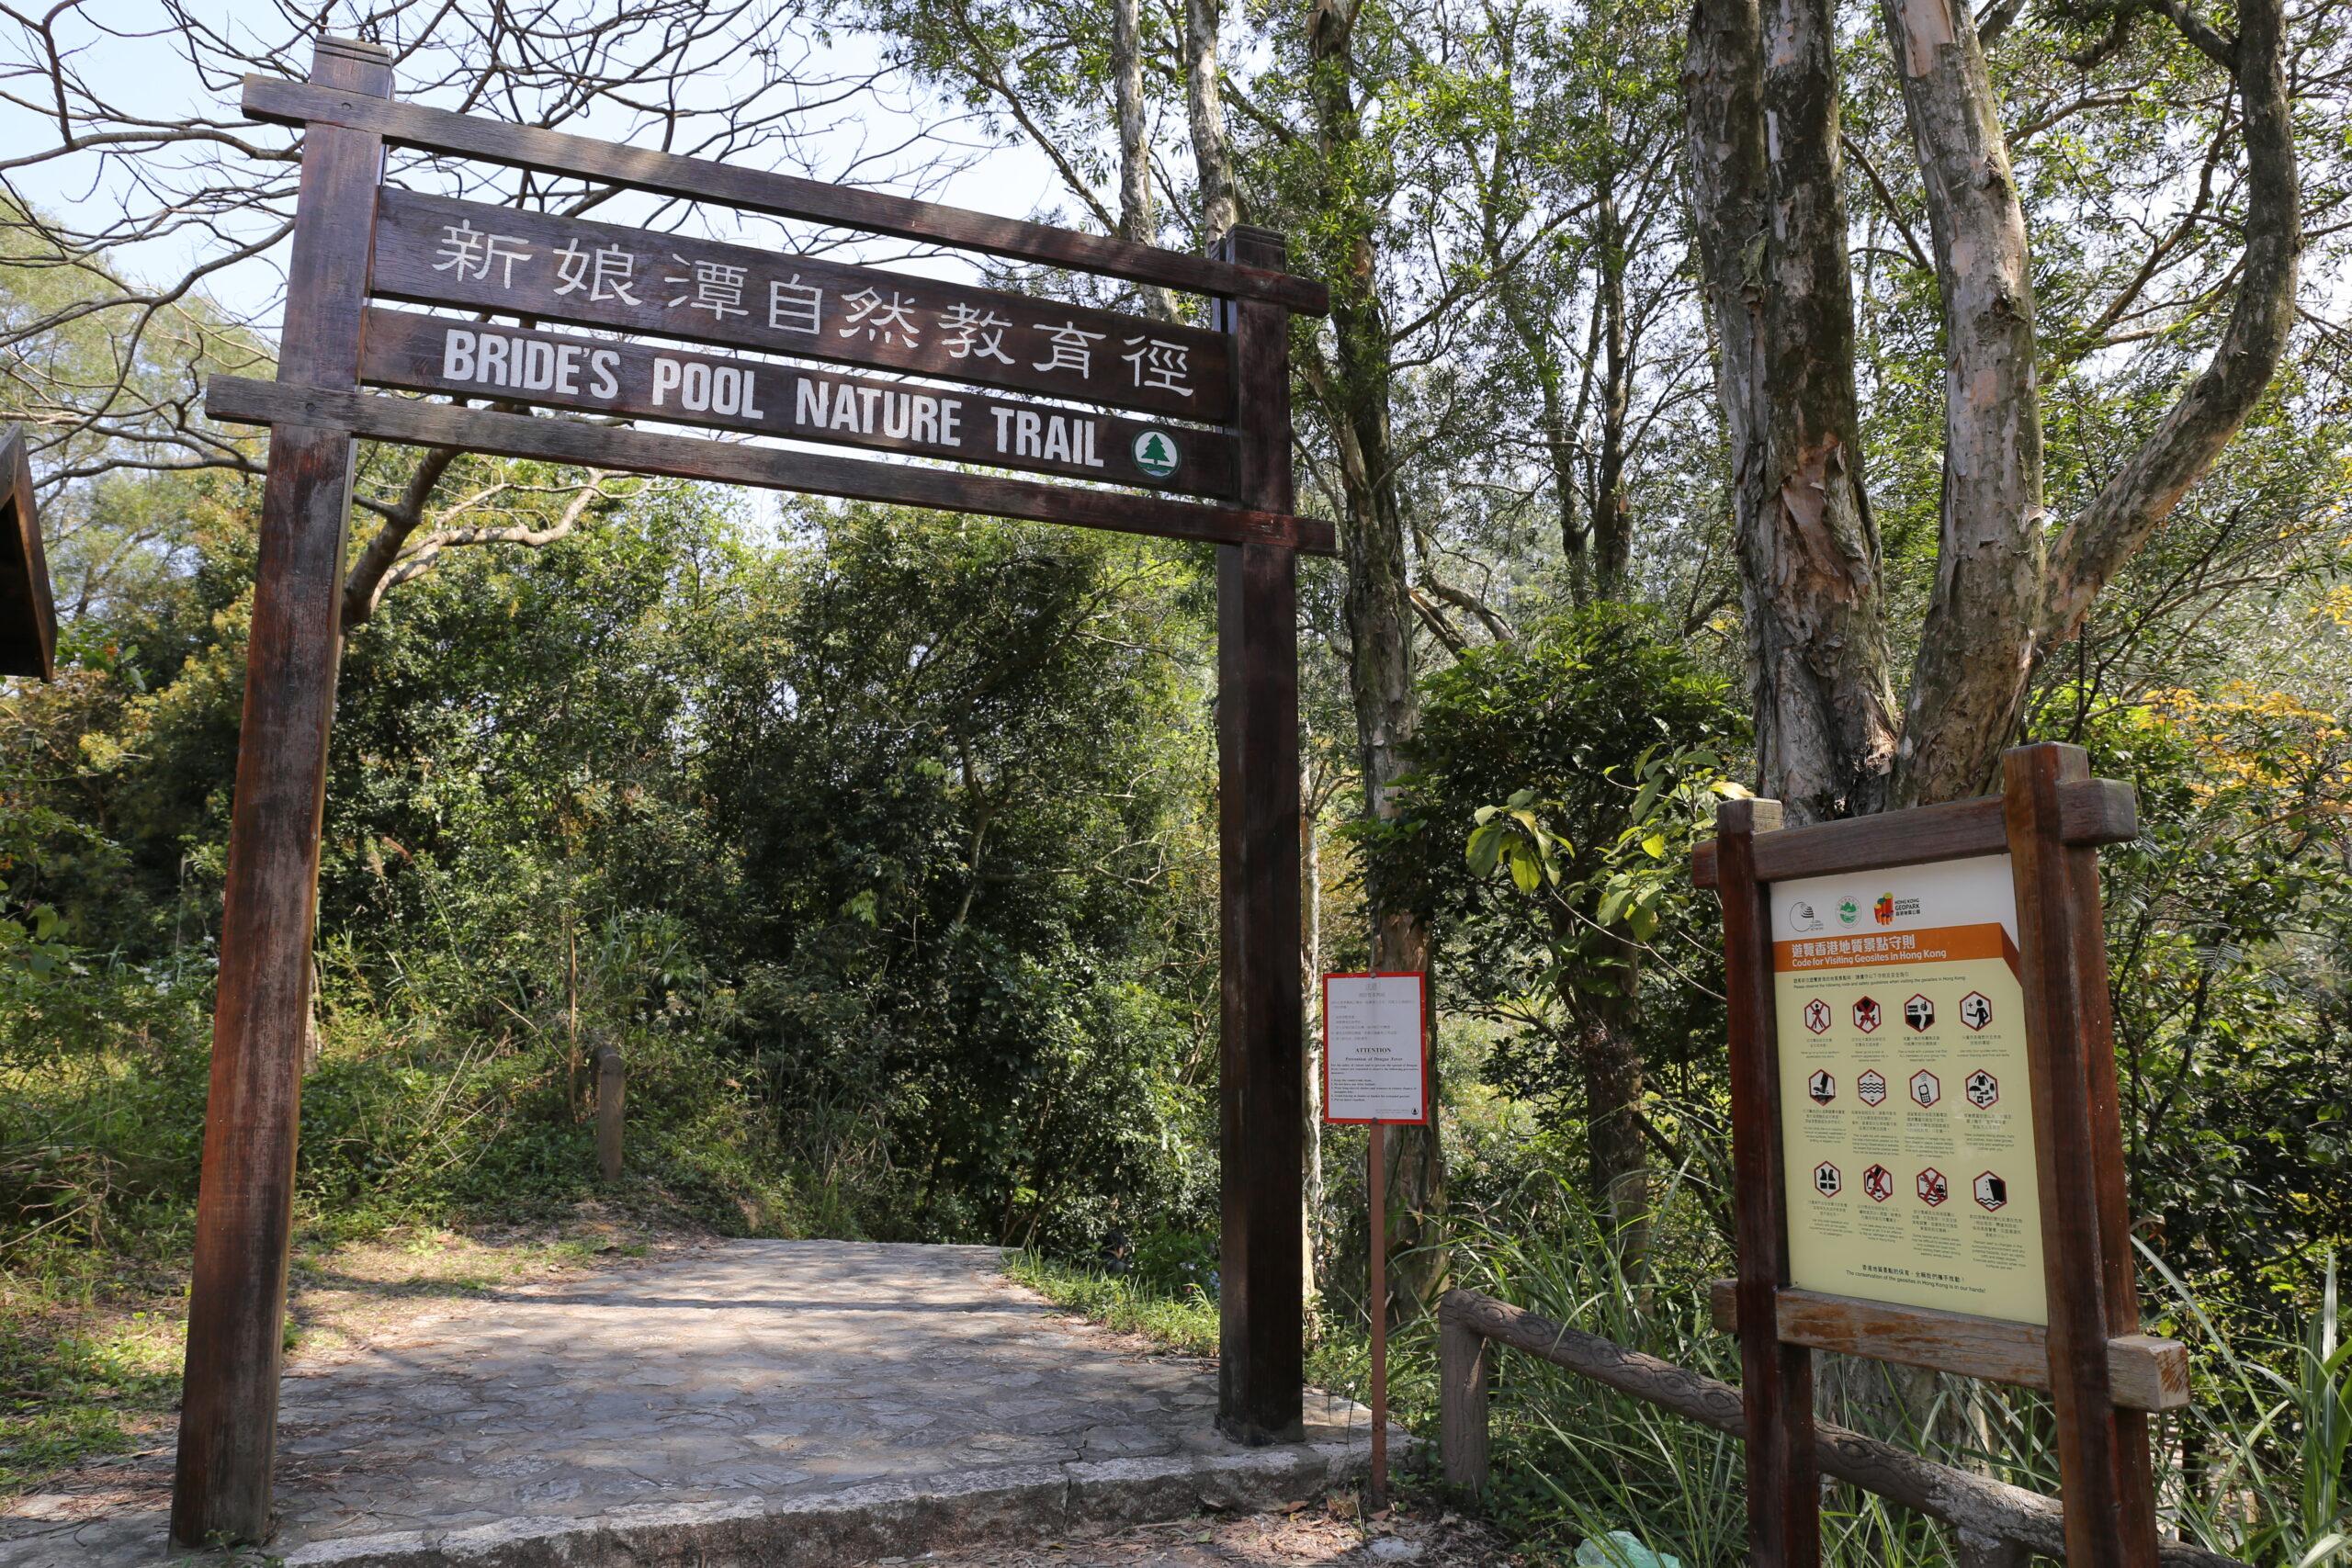 Bride's_Pool_Nature_trails_Entrance